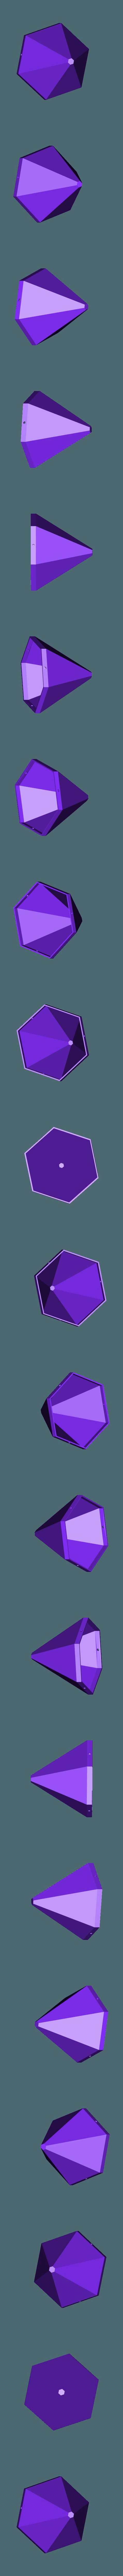 HexagonalBasedPyramidHangingPlanter.stl Download free STL file Hexagonal Based Pyramid Hanging Planter • 3D printable object, ranibizumab